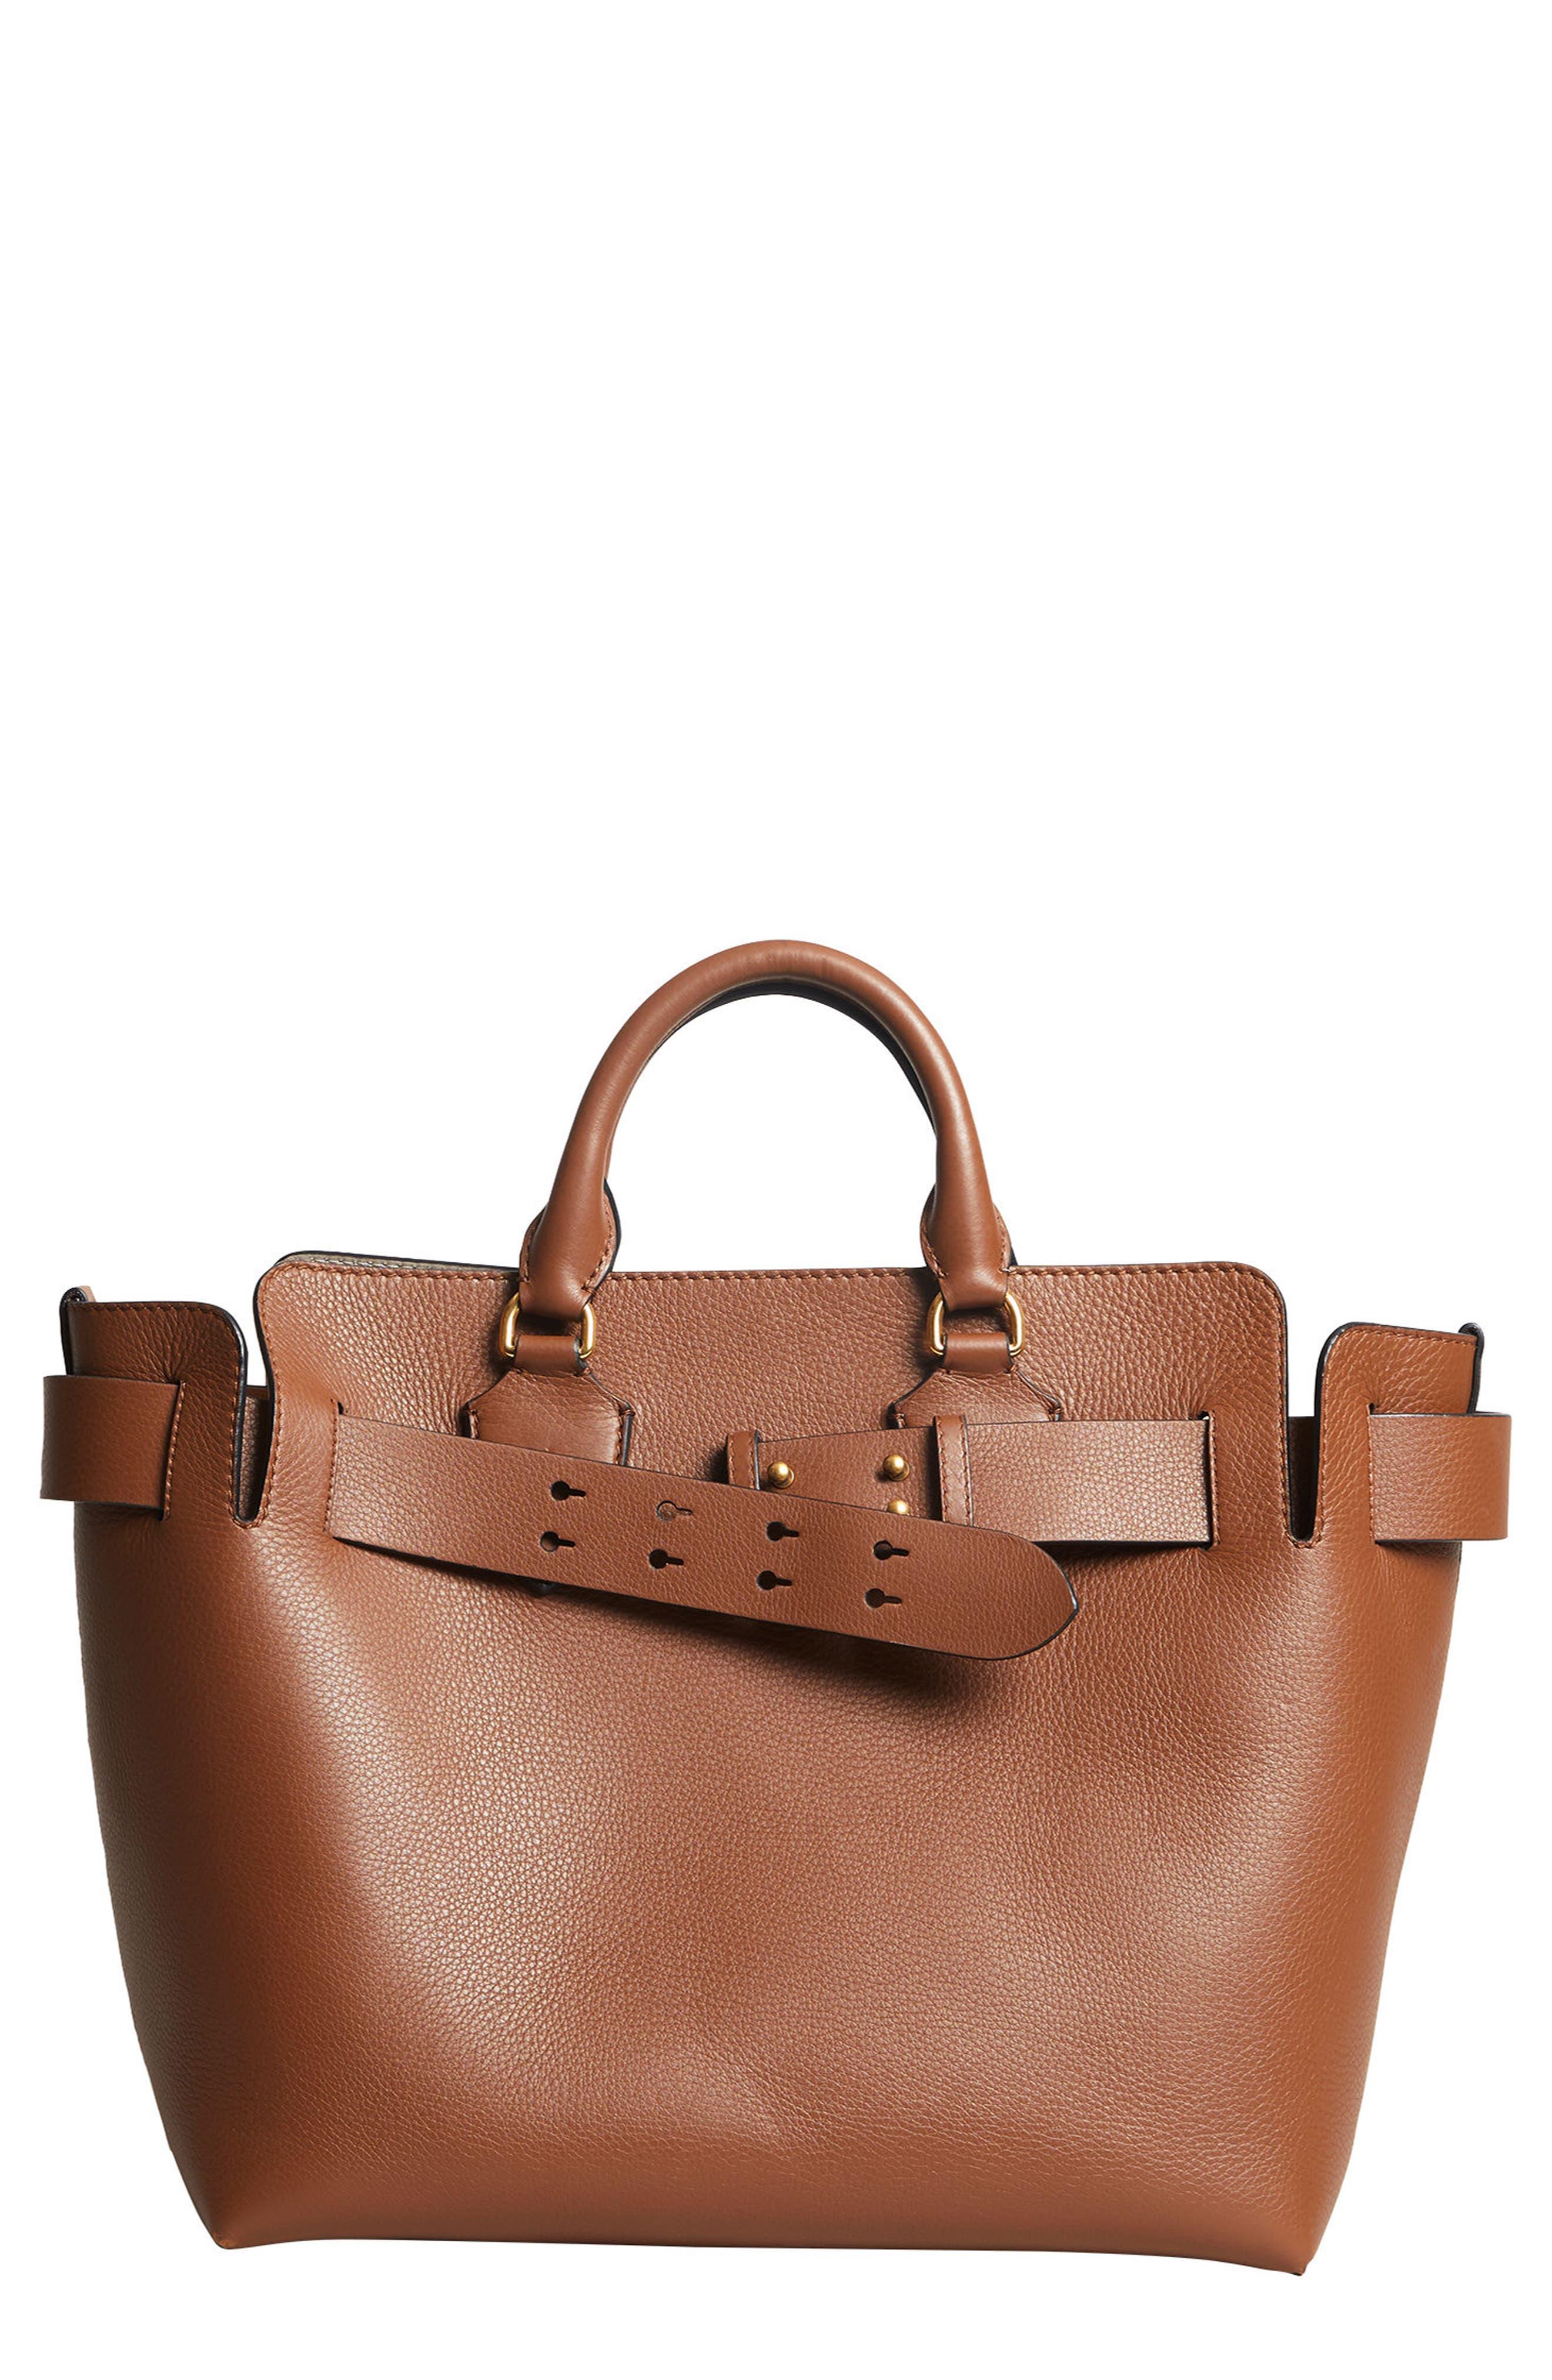 Medium Belt Bag Leather Tote,                             Main thumbnail 1, color,                             216